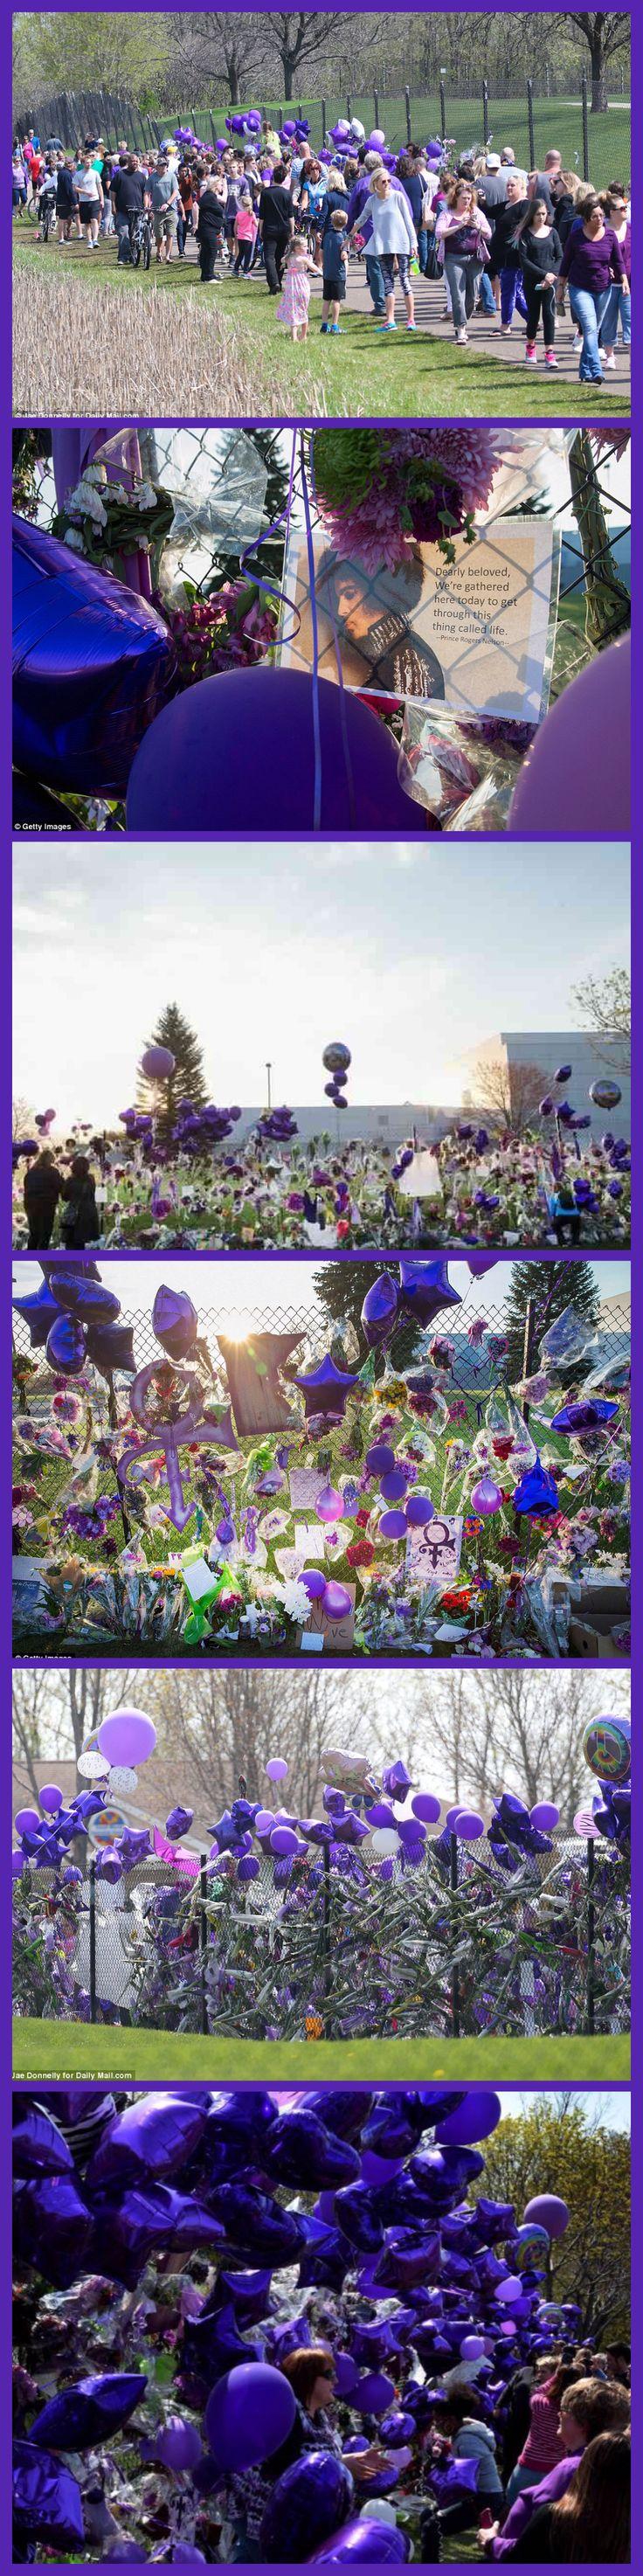 Prince memorial at Paisley Park